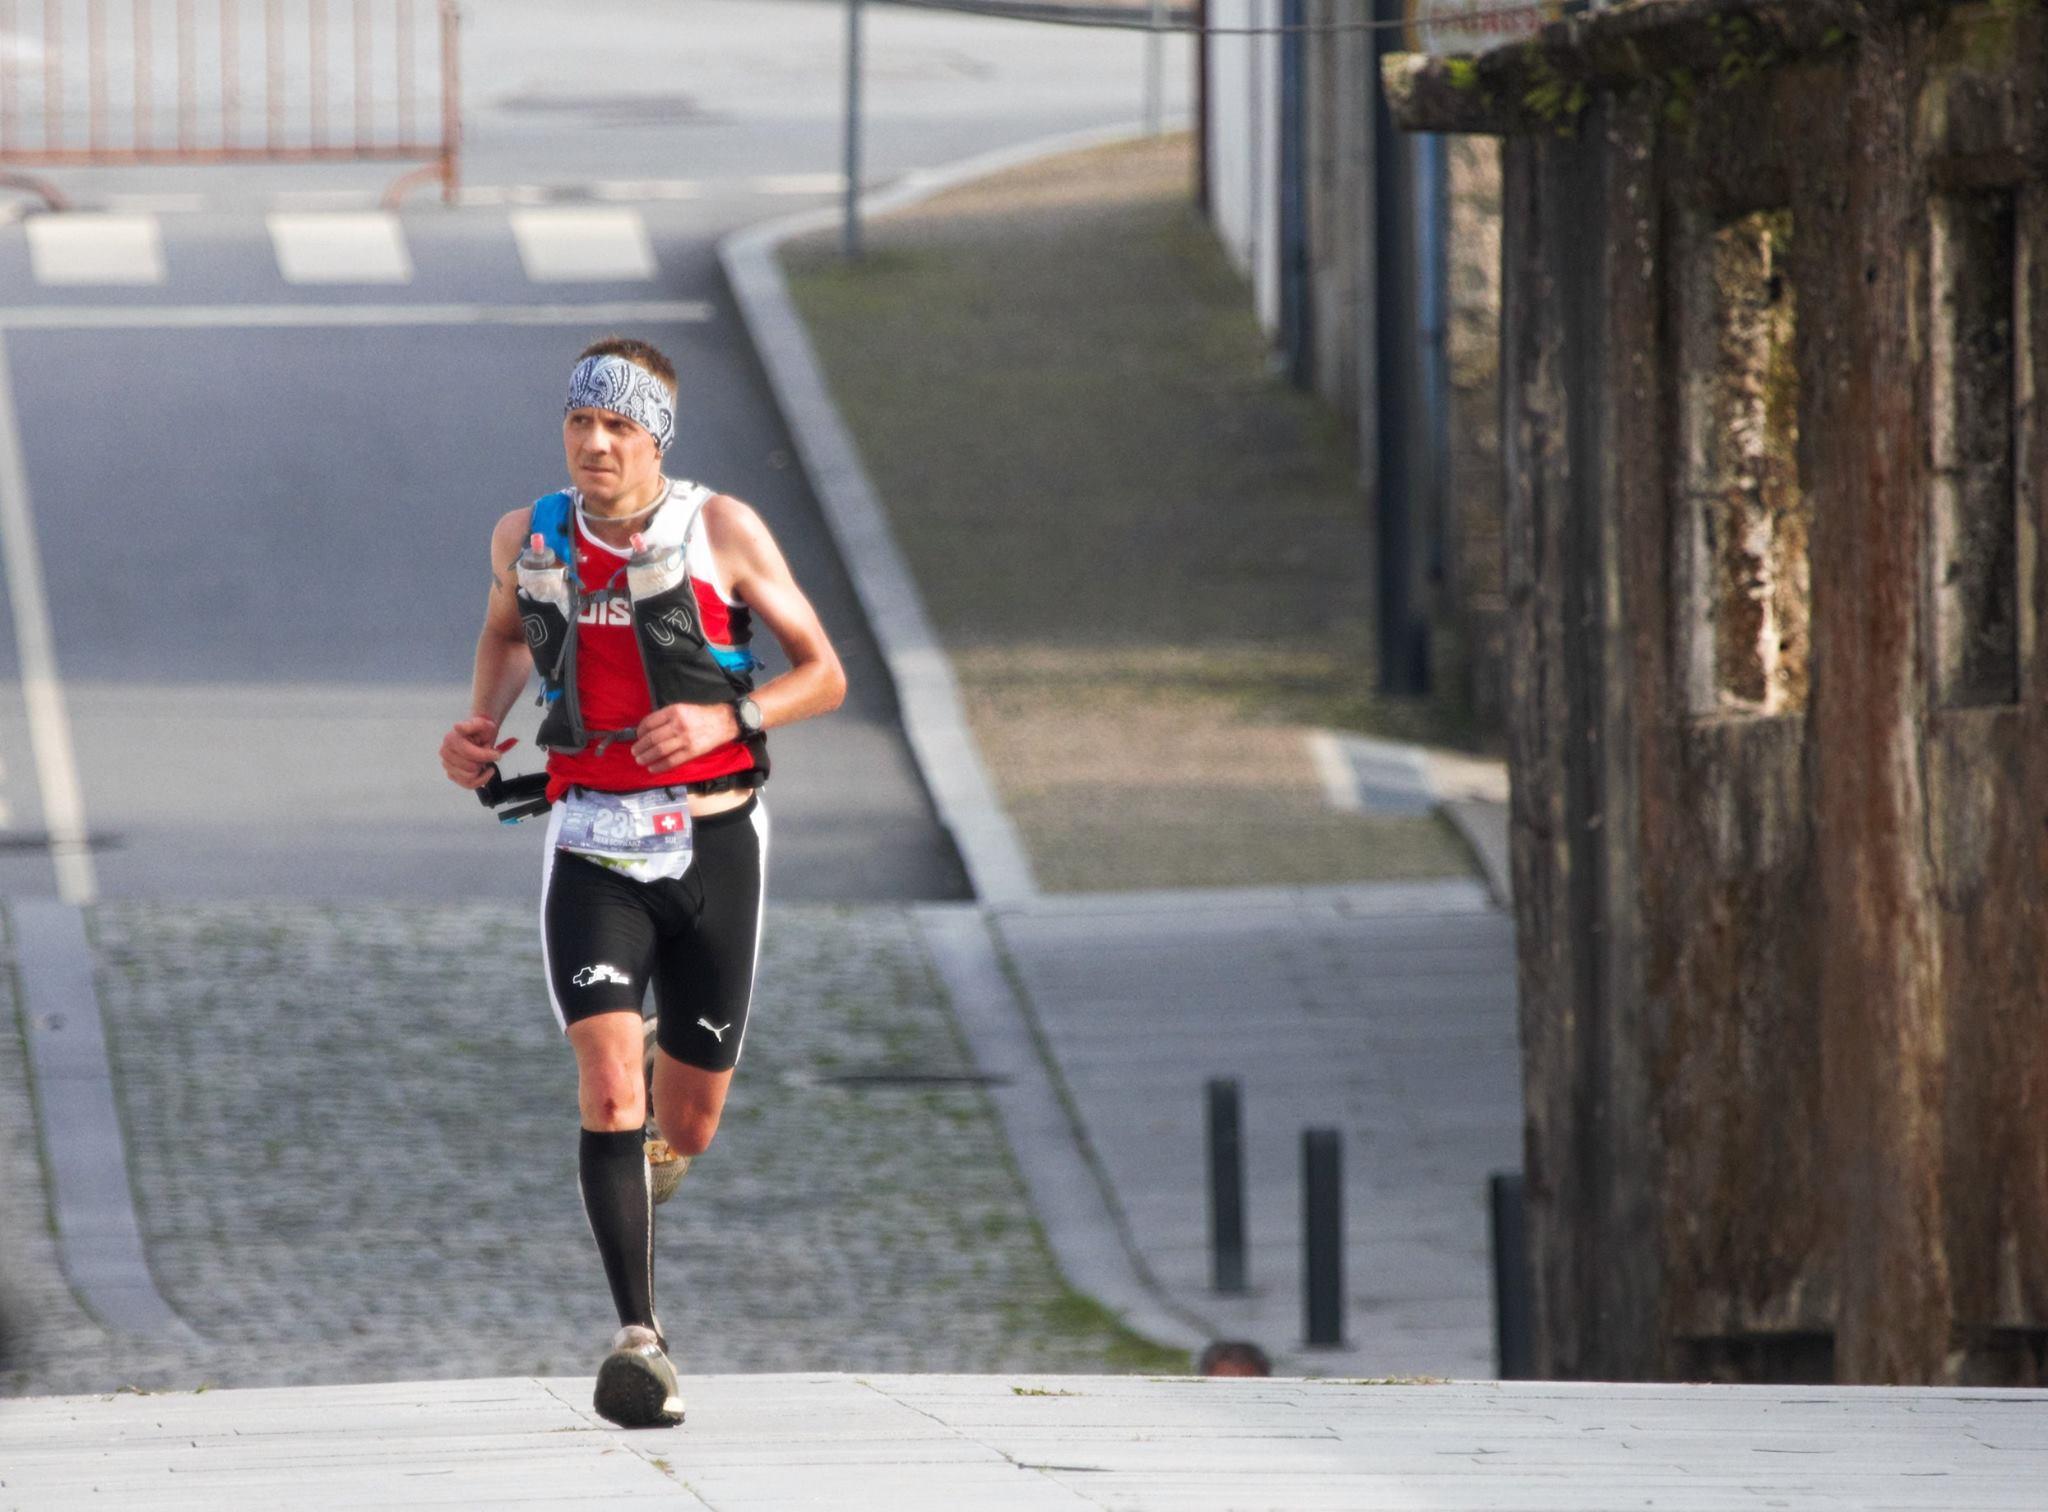 Trans Peneda Gerês - Trail World Championships 2016